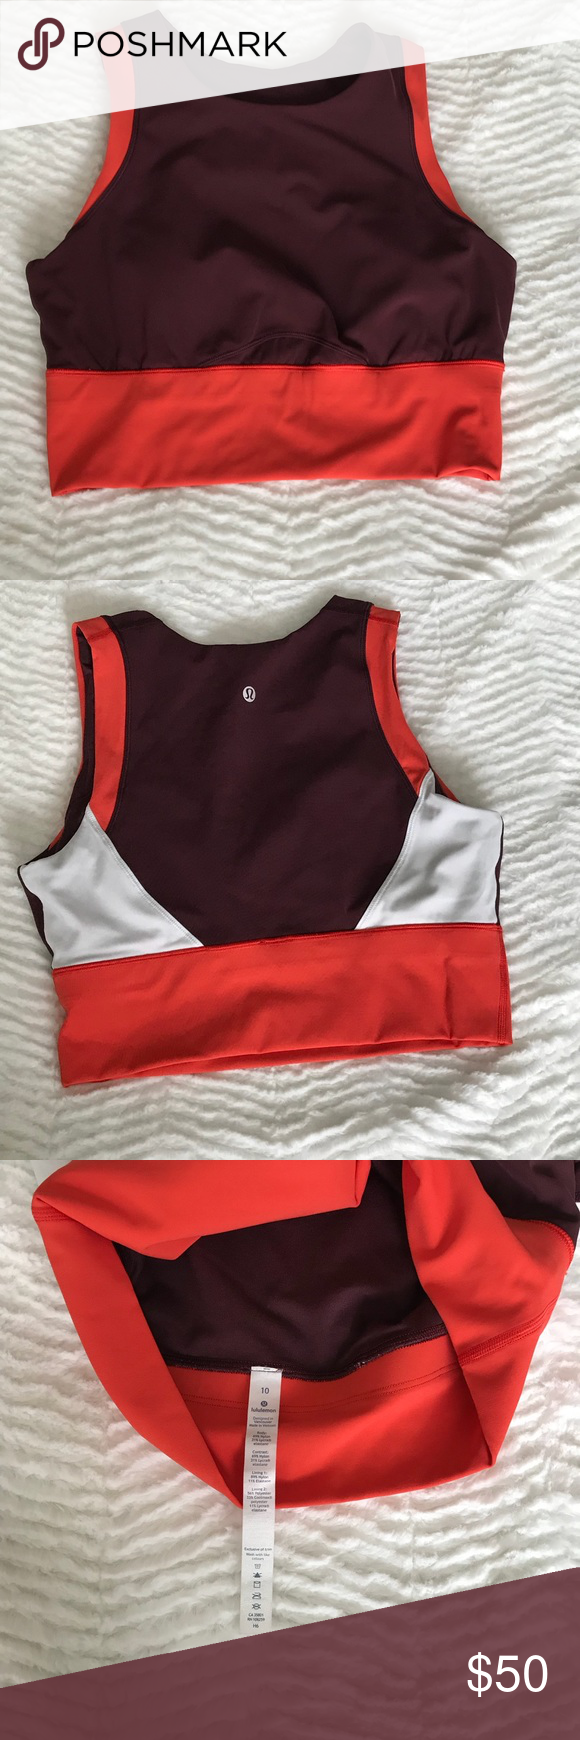 Lululemon Kick Serve Sweat Bra Athletic tank tops, Women